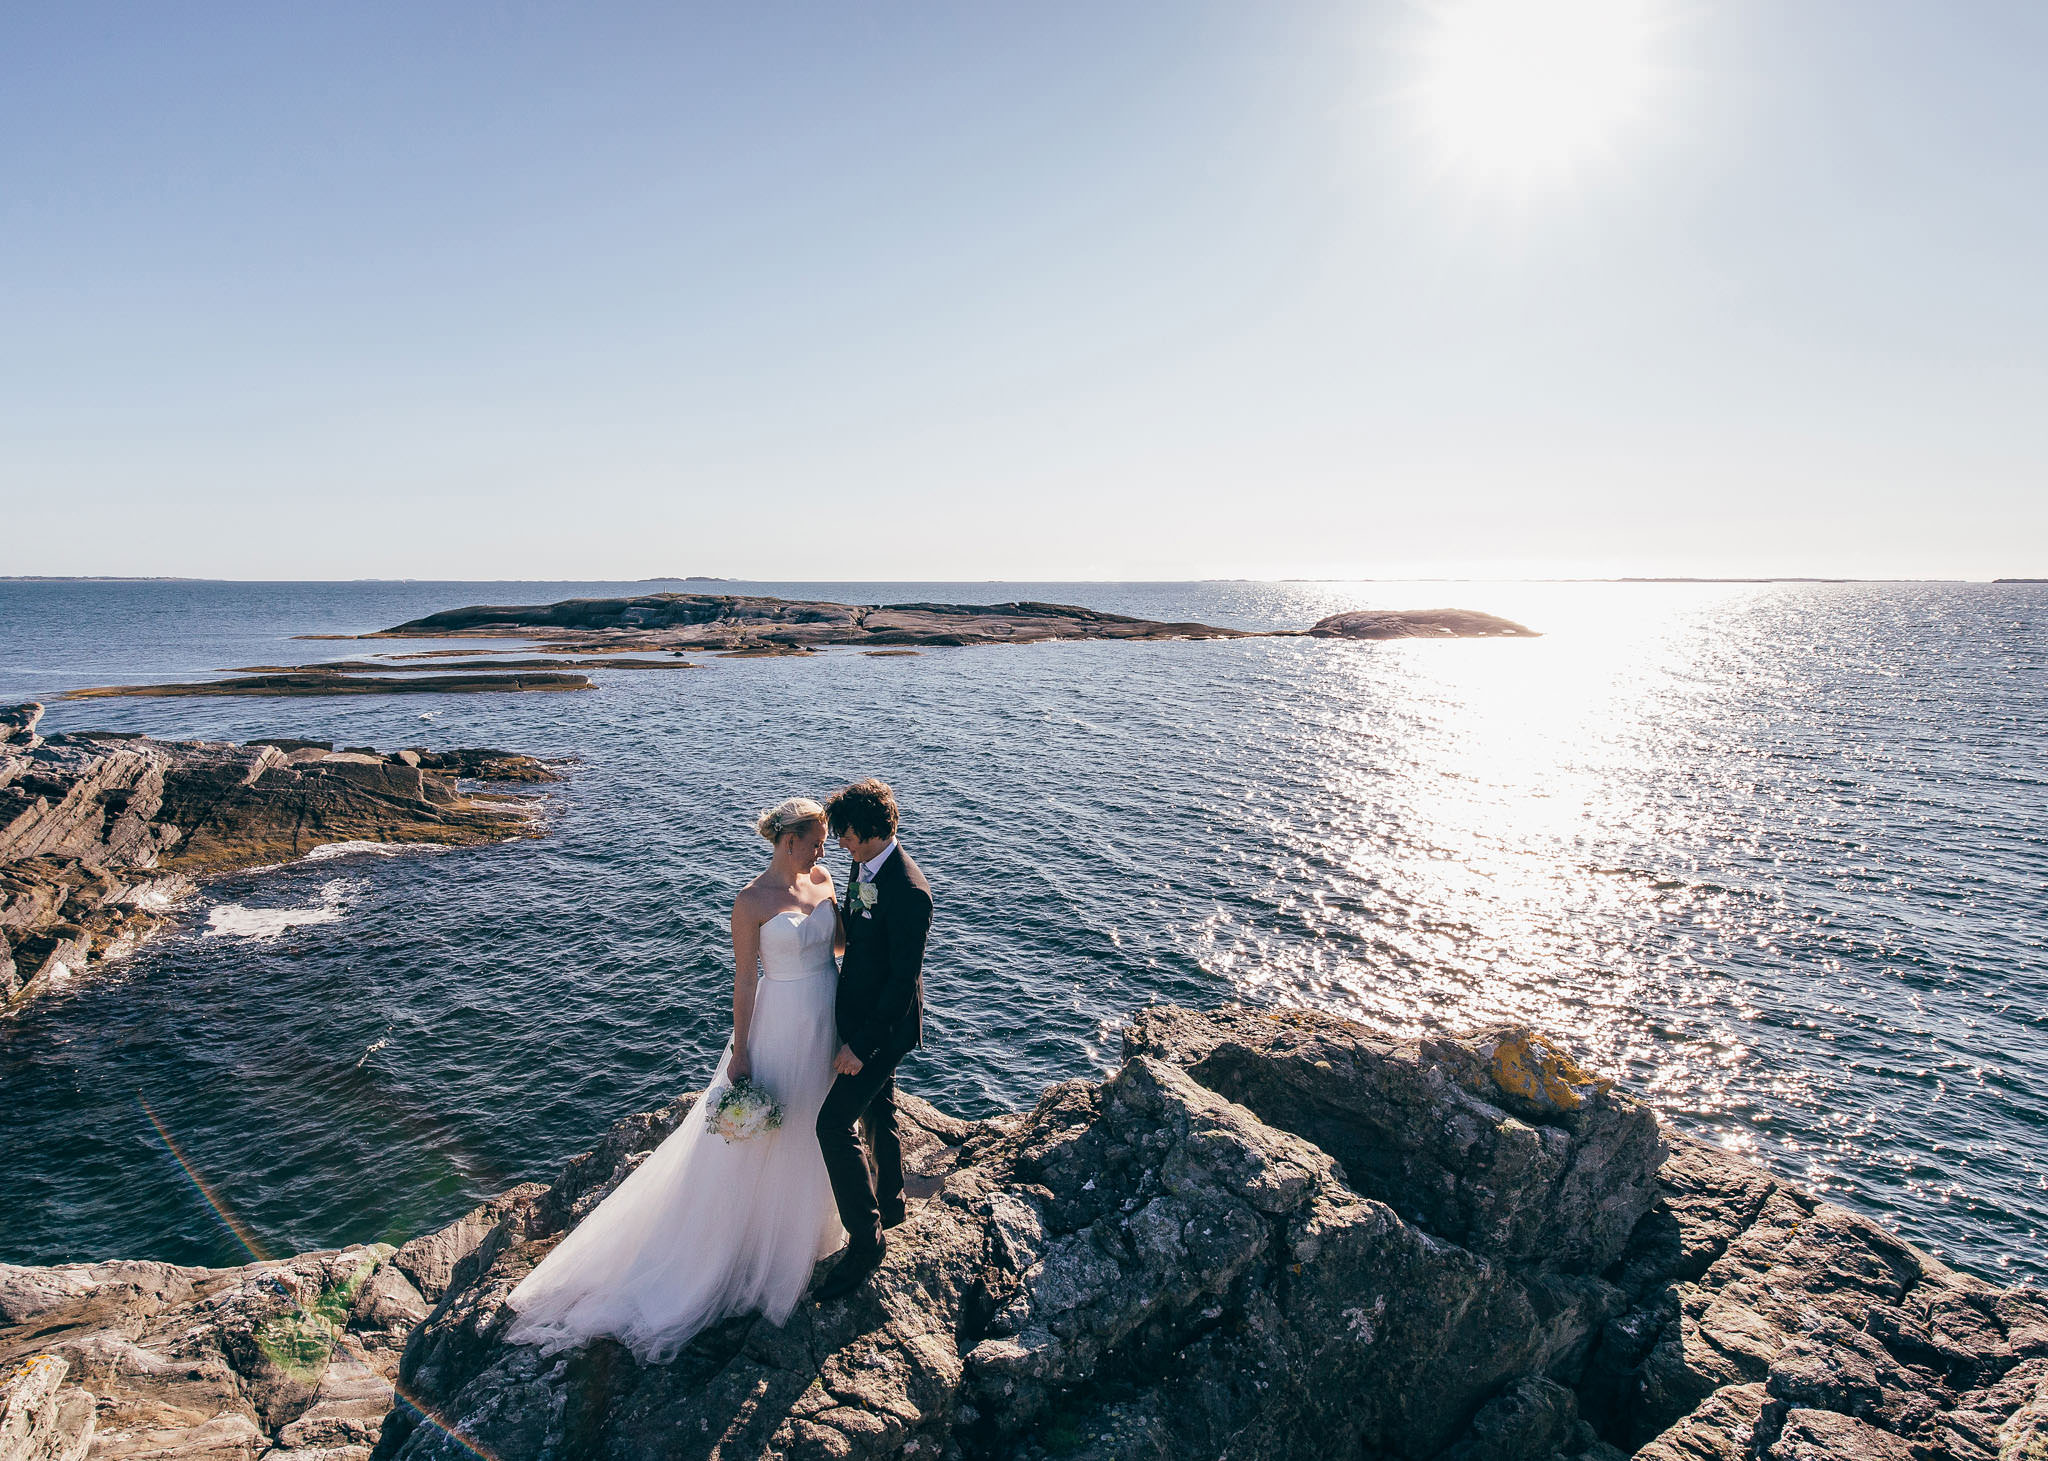 Wedding+Photographer+Norway+Bryllupsfotograf+Casey+Arneson+JT-131.jpg